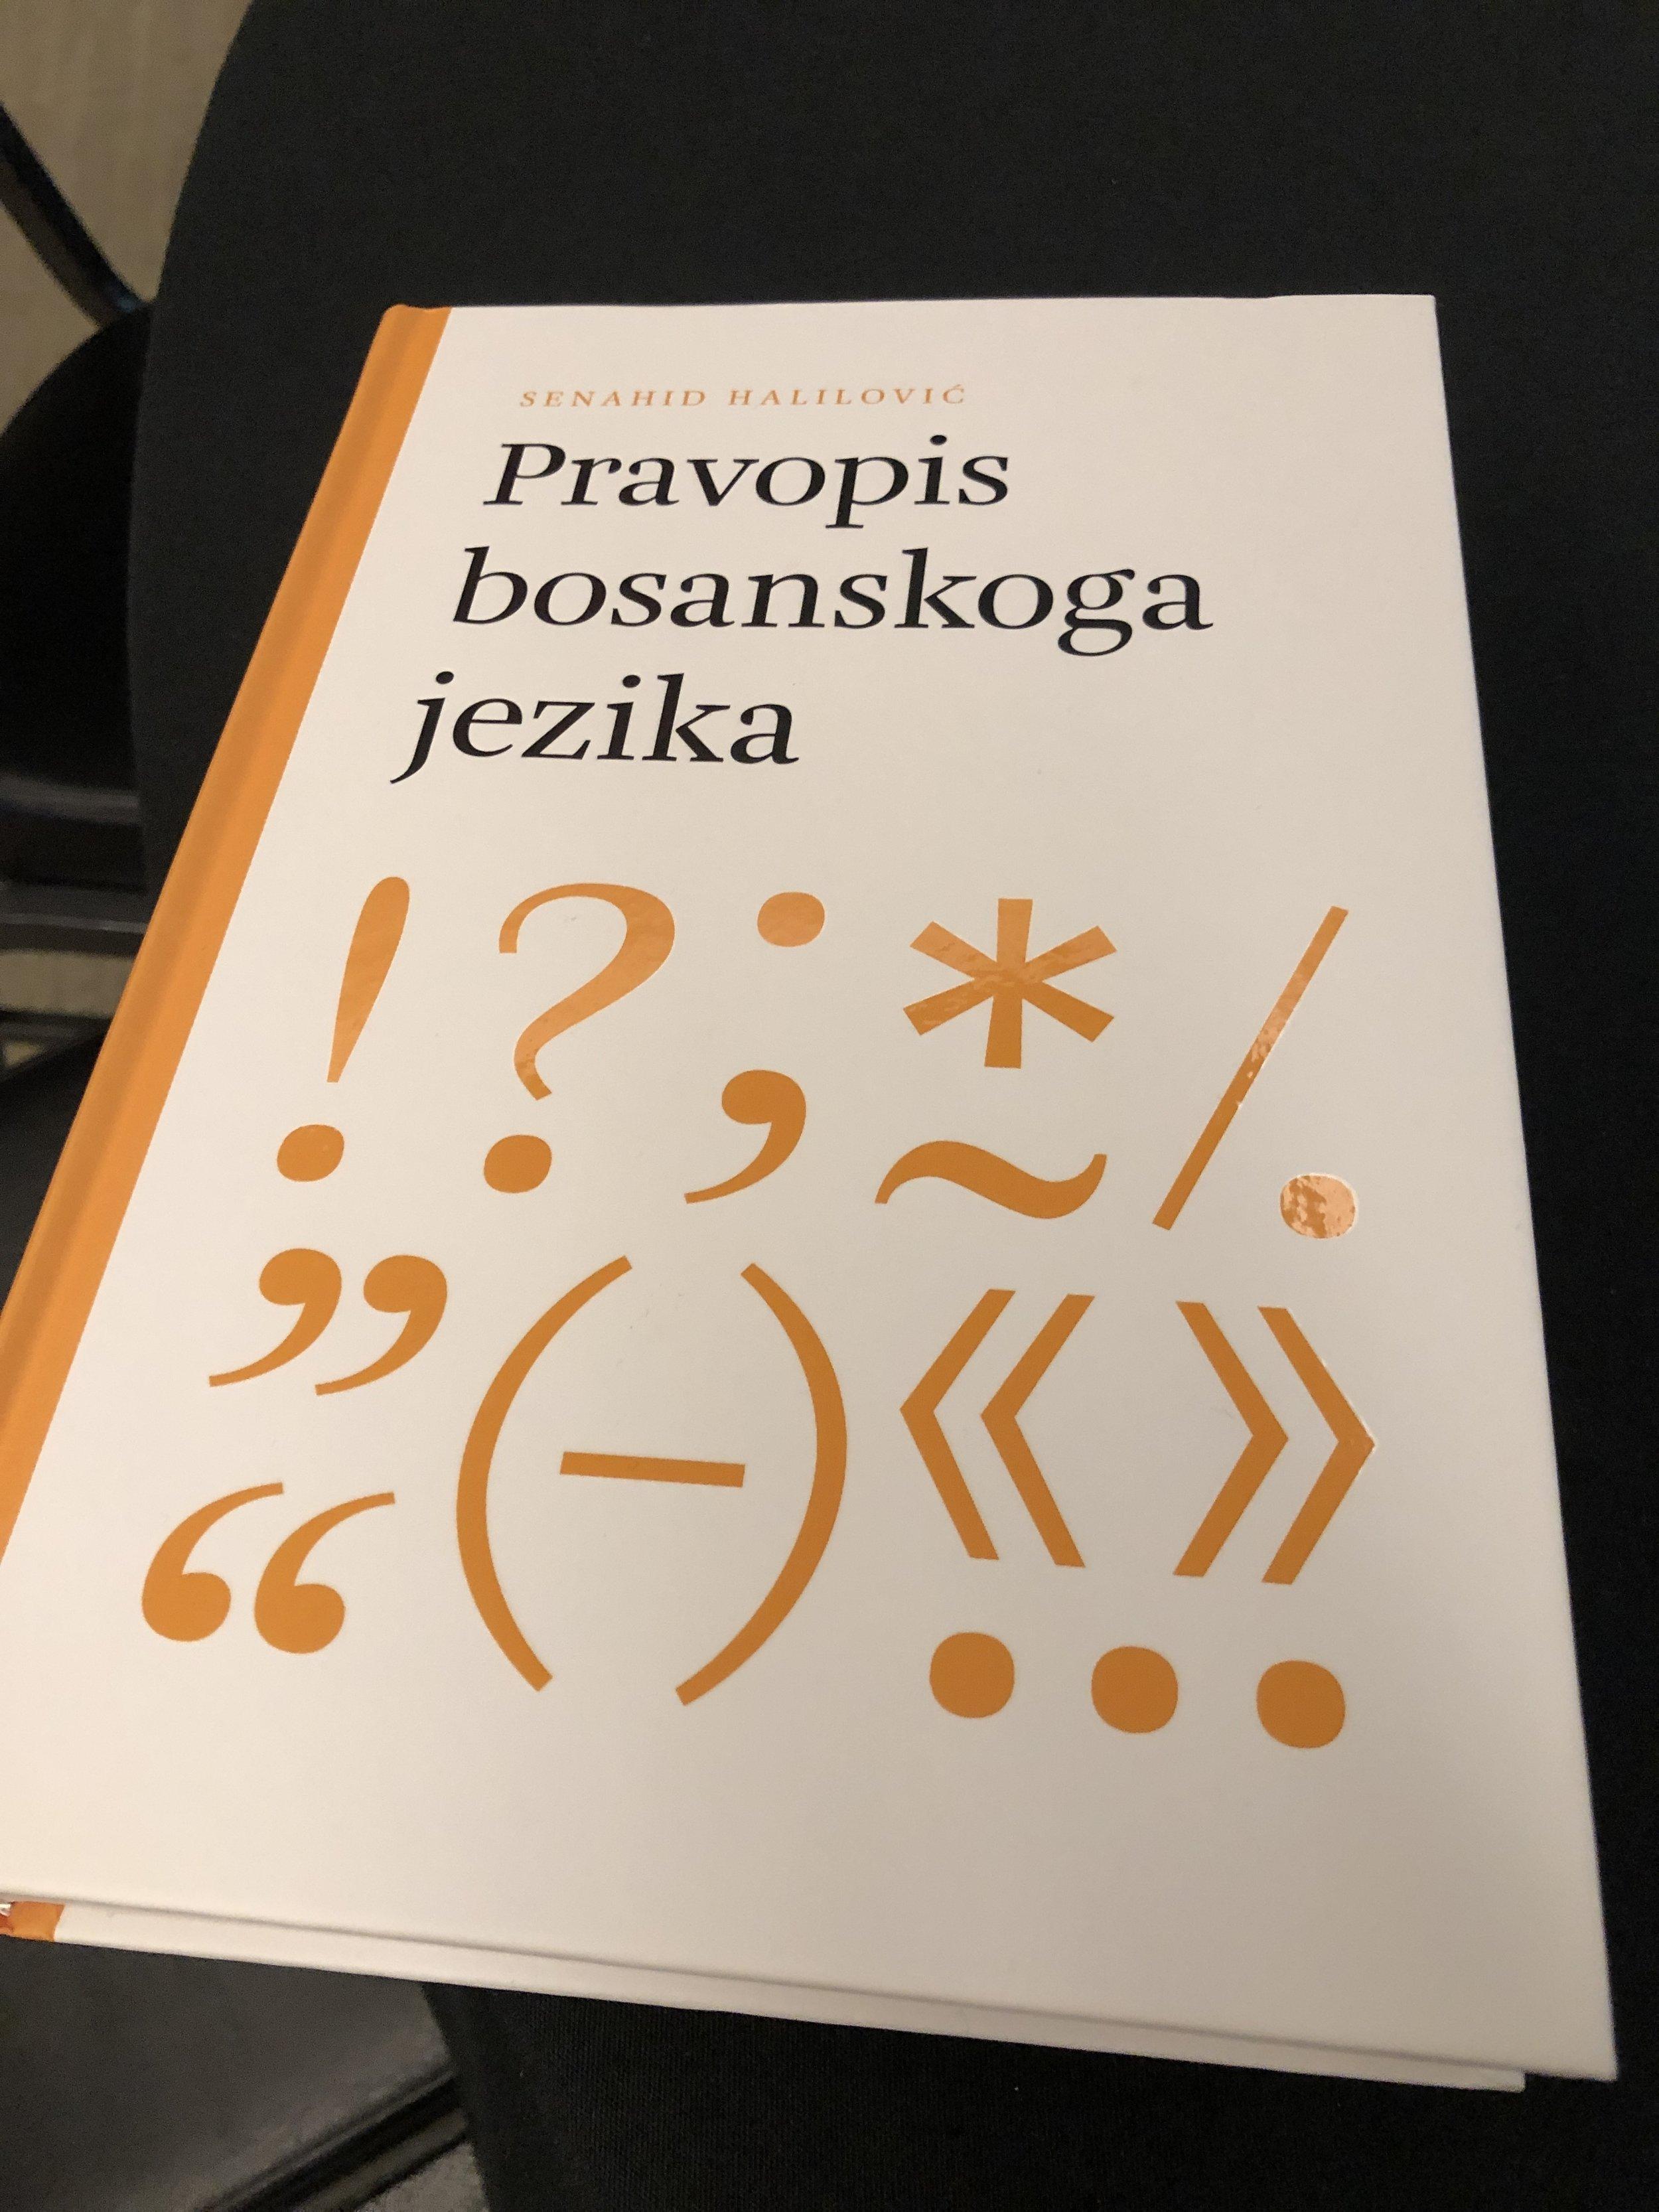 "Senahid Halilovič's book titled ""Pravopis bosanskoga jezika,"" meaning ""Spelling of the Bosnian Language."""